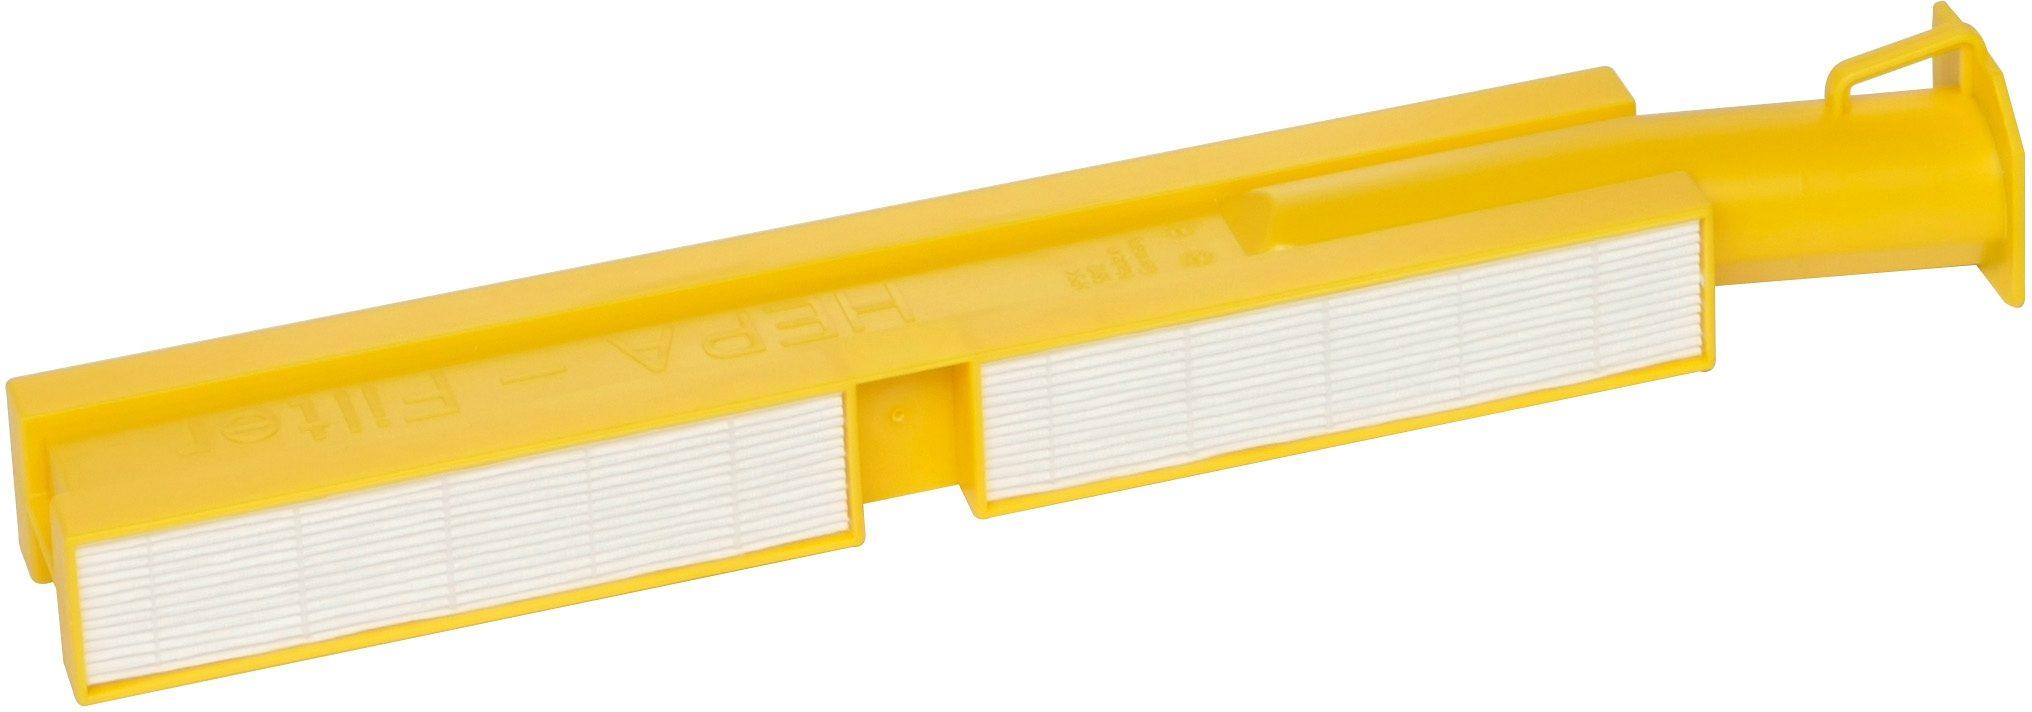 Sebo HEPA Filter für SEBO AUTOMATIC X